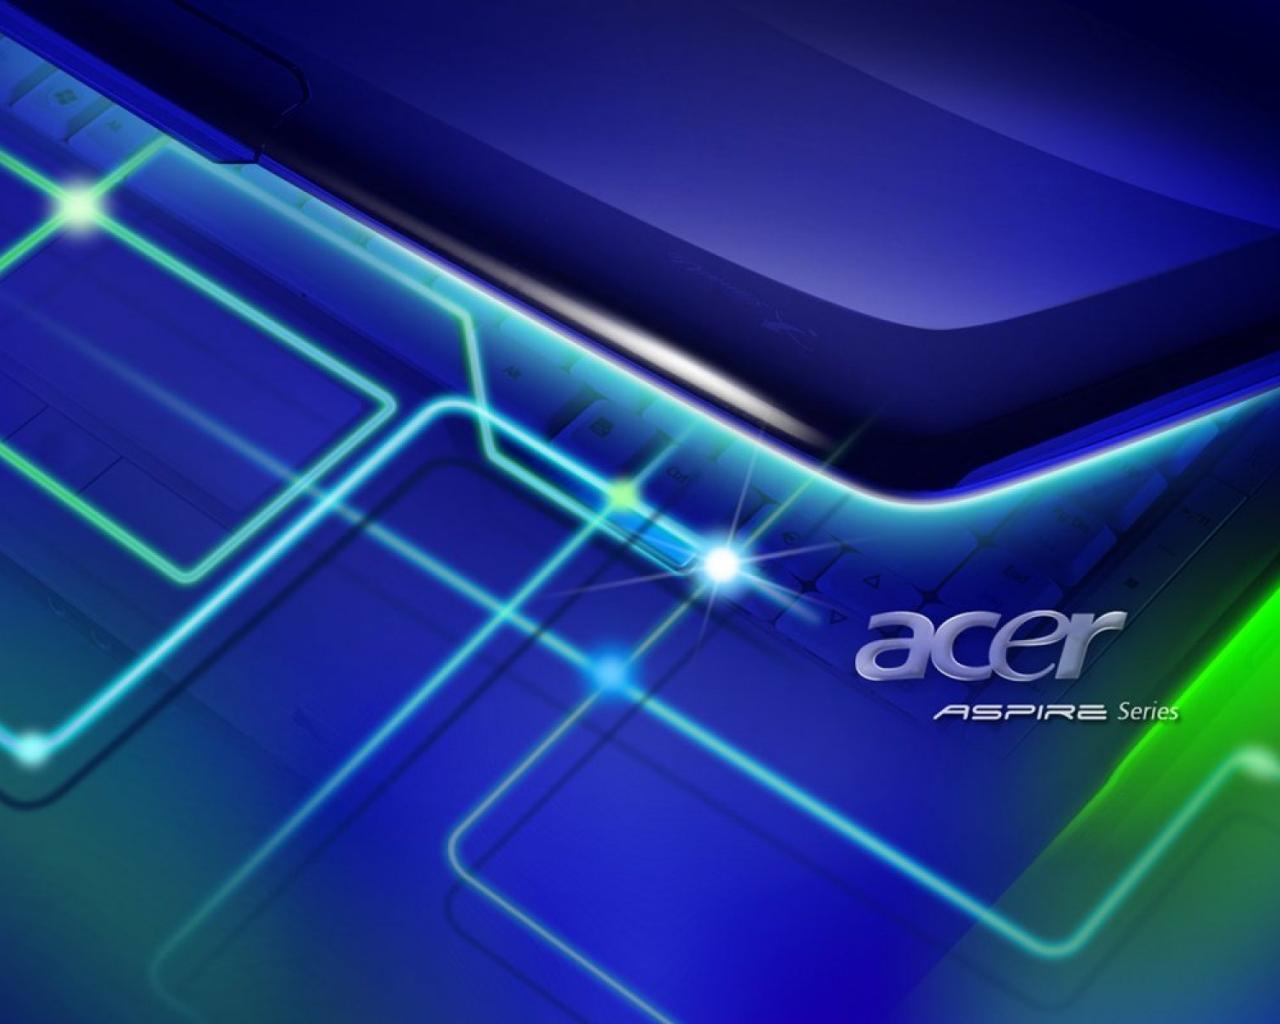 Acer aspire обои - 9b46